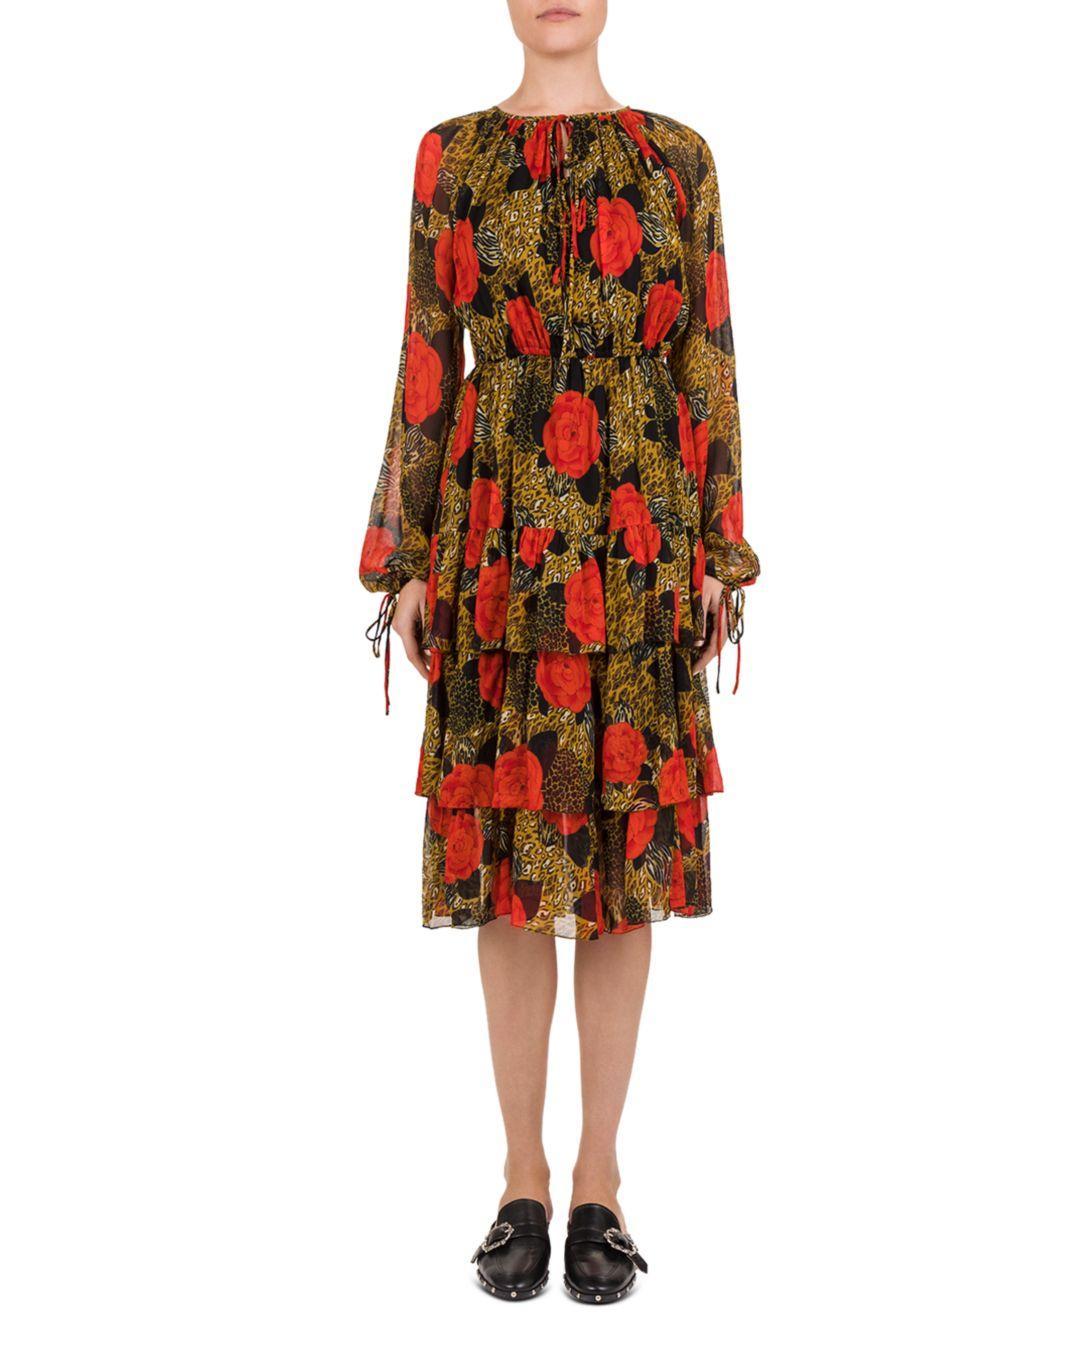 95fea65fc0 Lyst - The Kooples Jungle Flowers Printed Midi Dress in Red